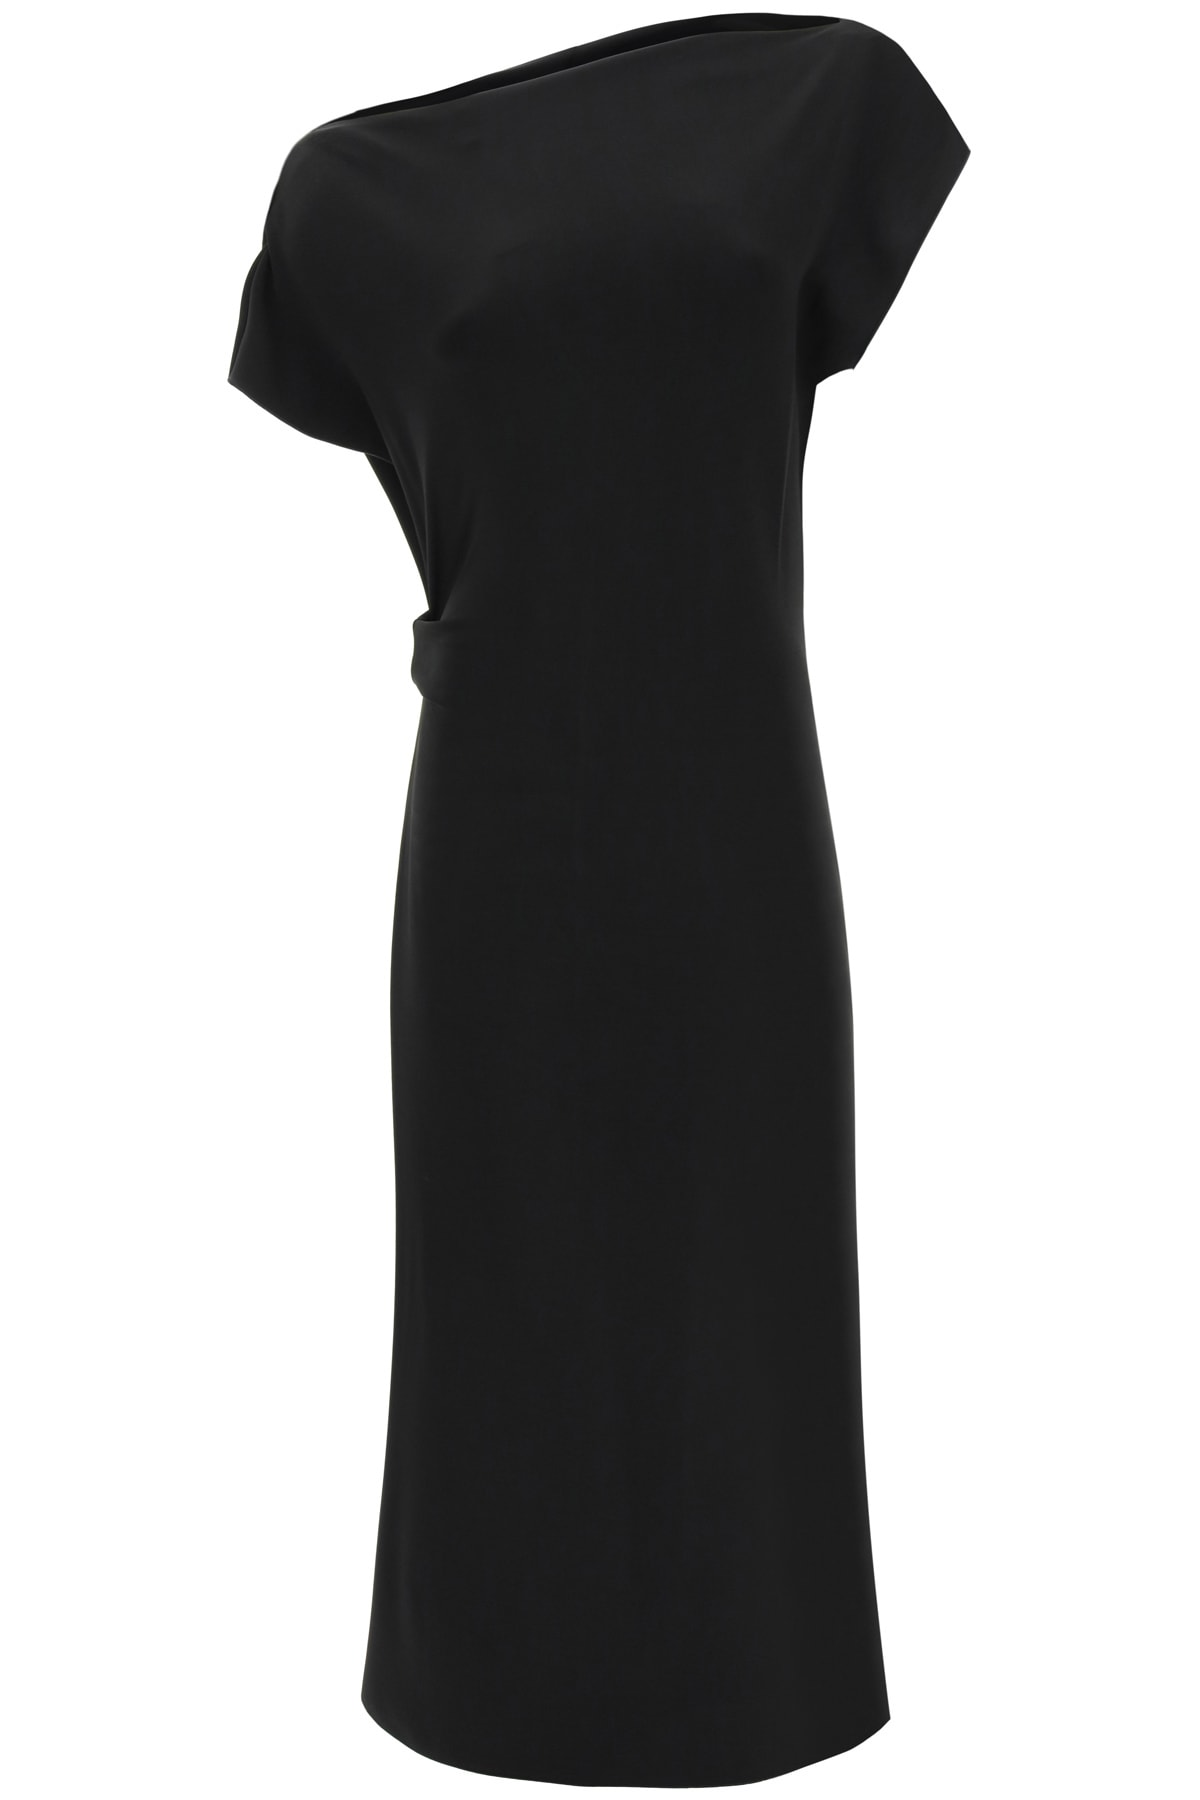 Sportmax STRETCH VISCOSE JERSEY DRESS